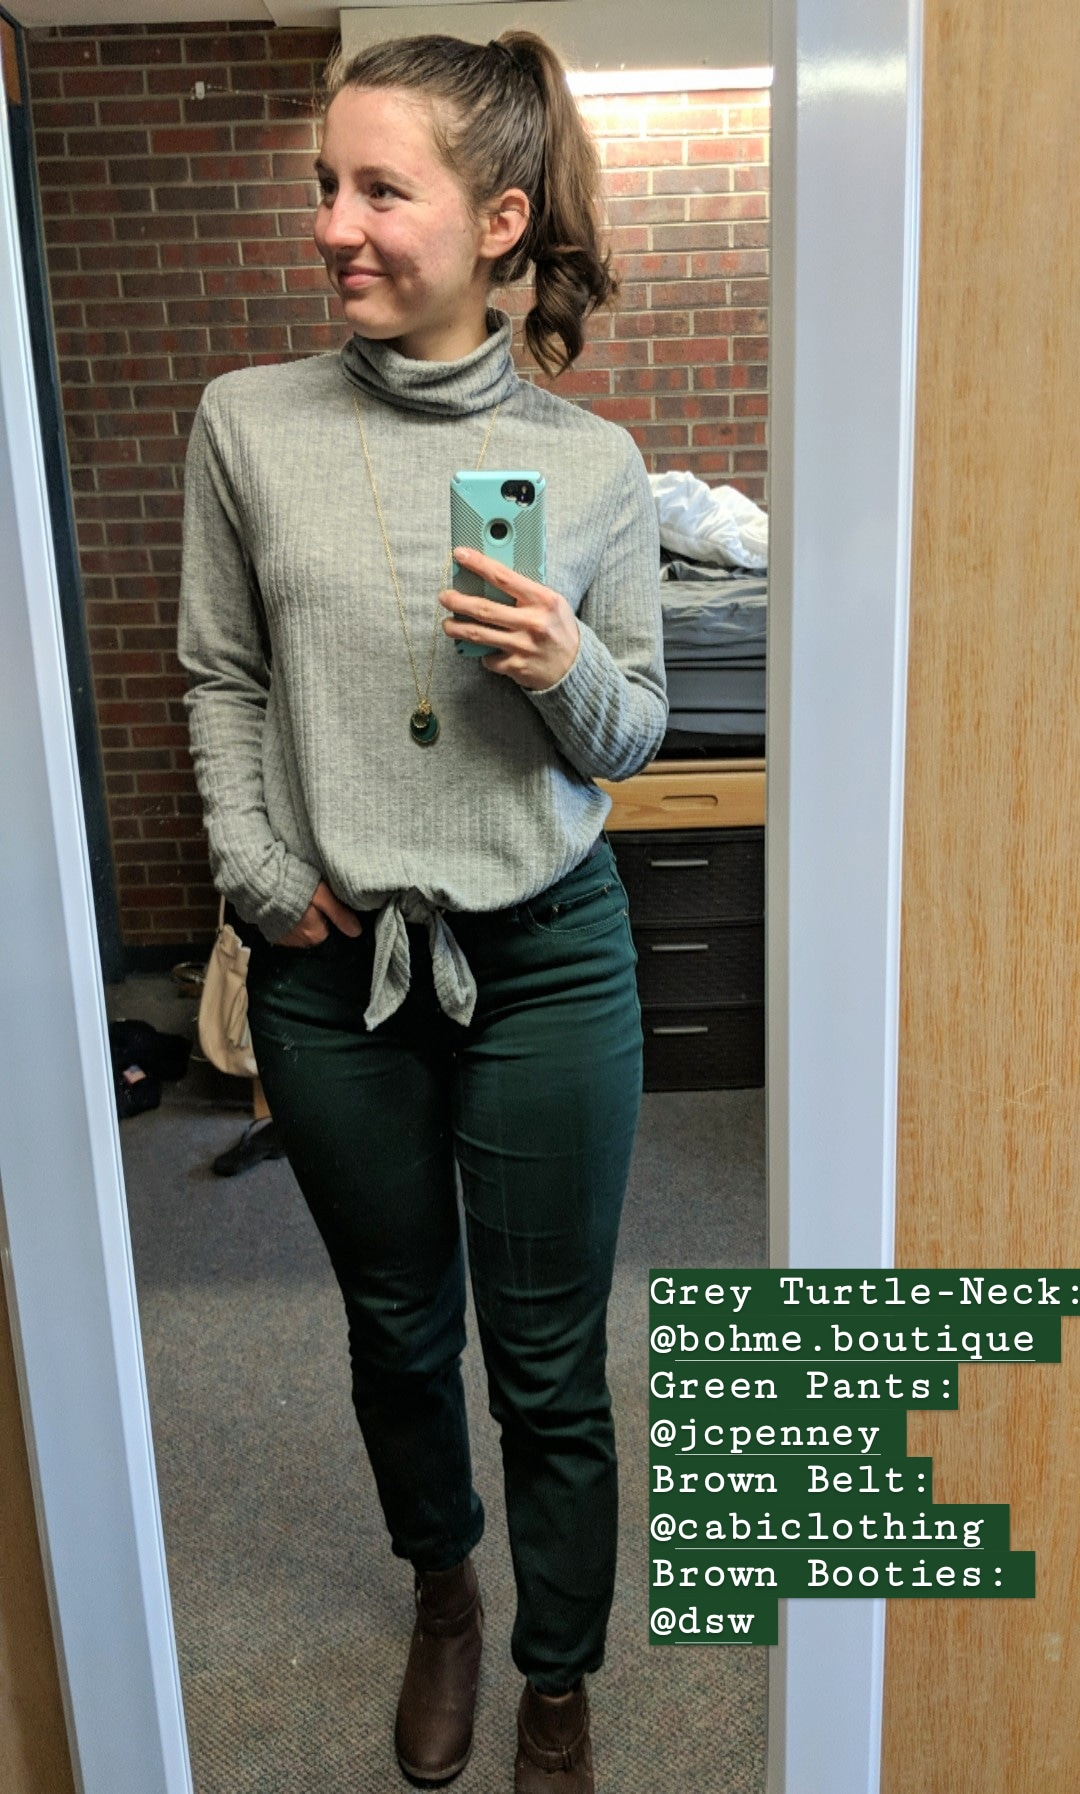 grey turtleneck, green pants, brown booties